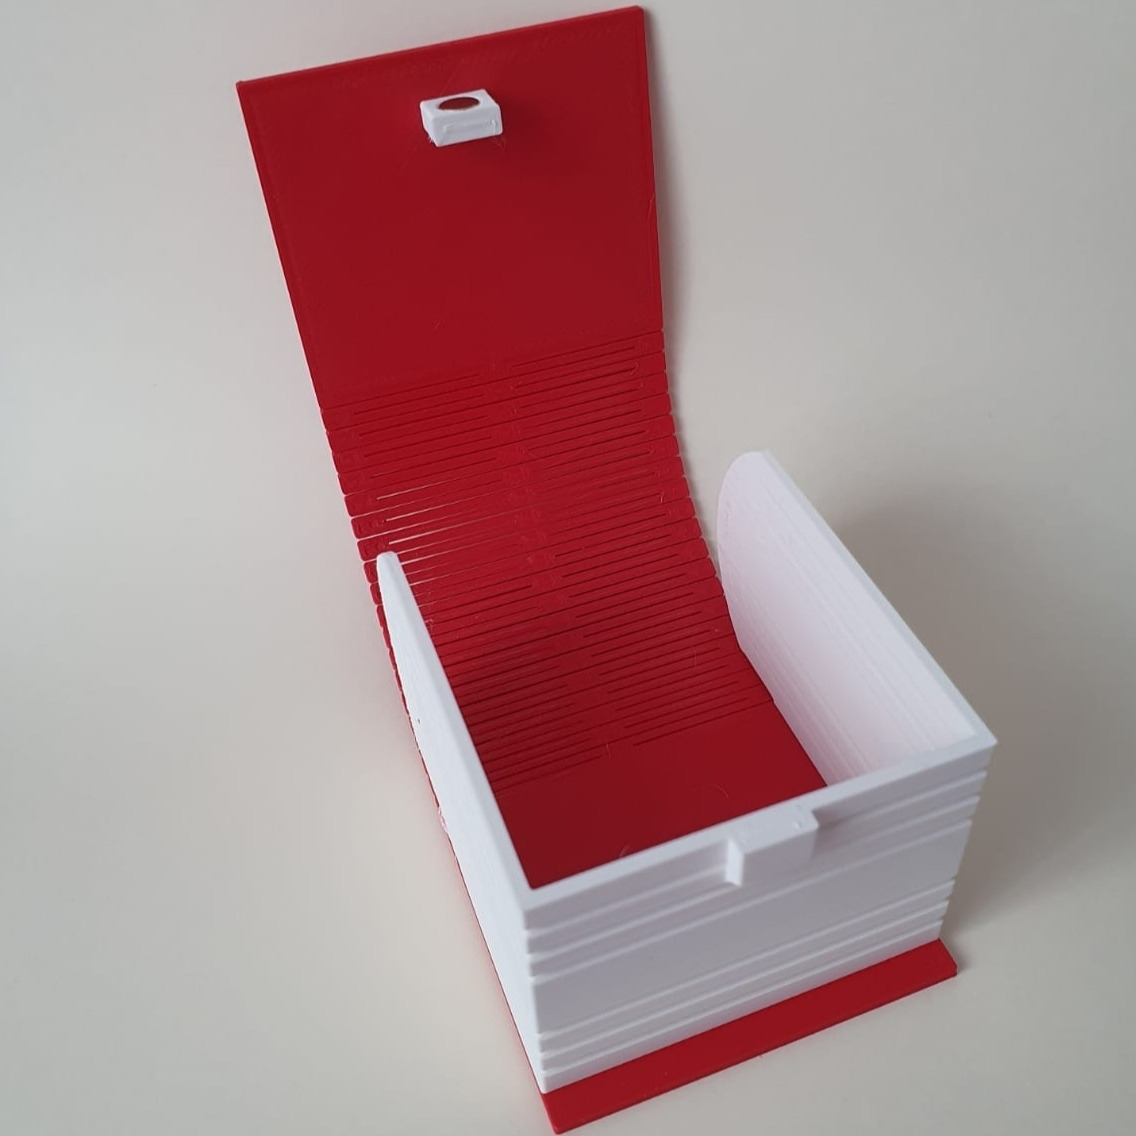 IMG_20201005_174724.jpg Download STL file Living hinge box #1 • Design to 3D print, the-lazy-engineer